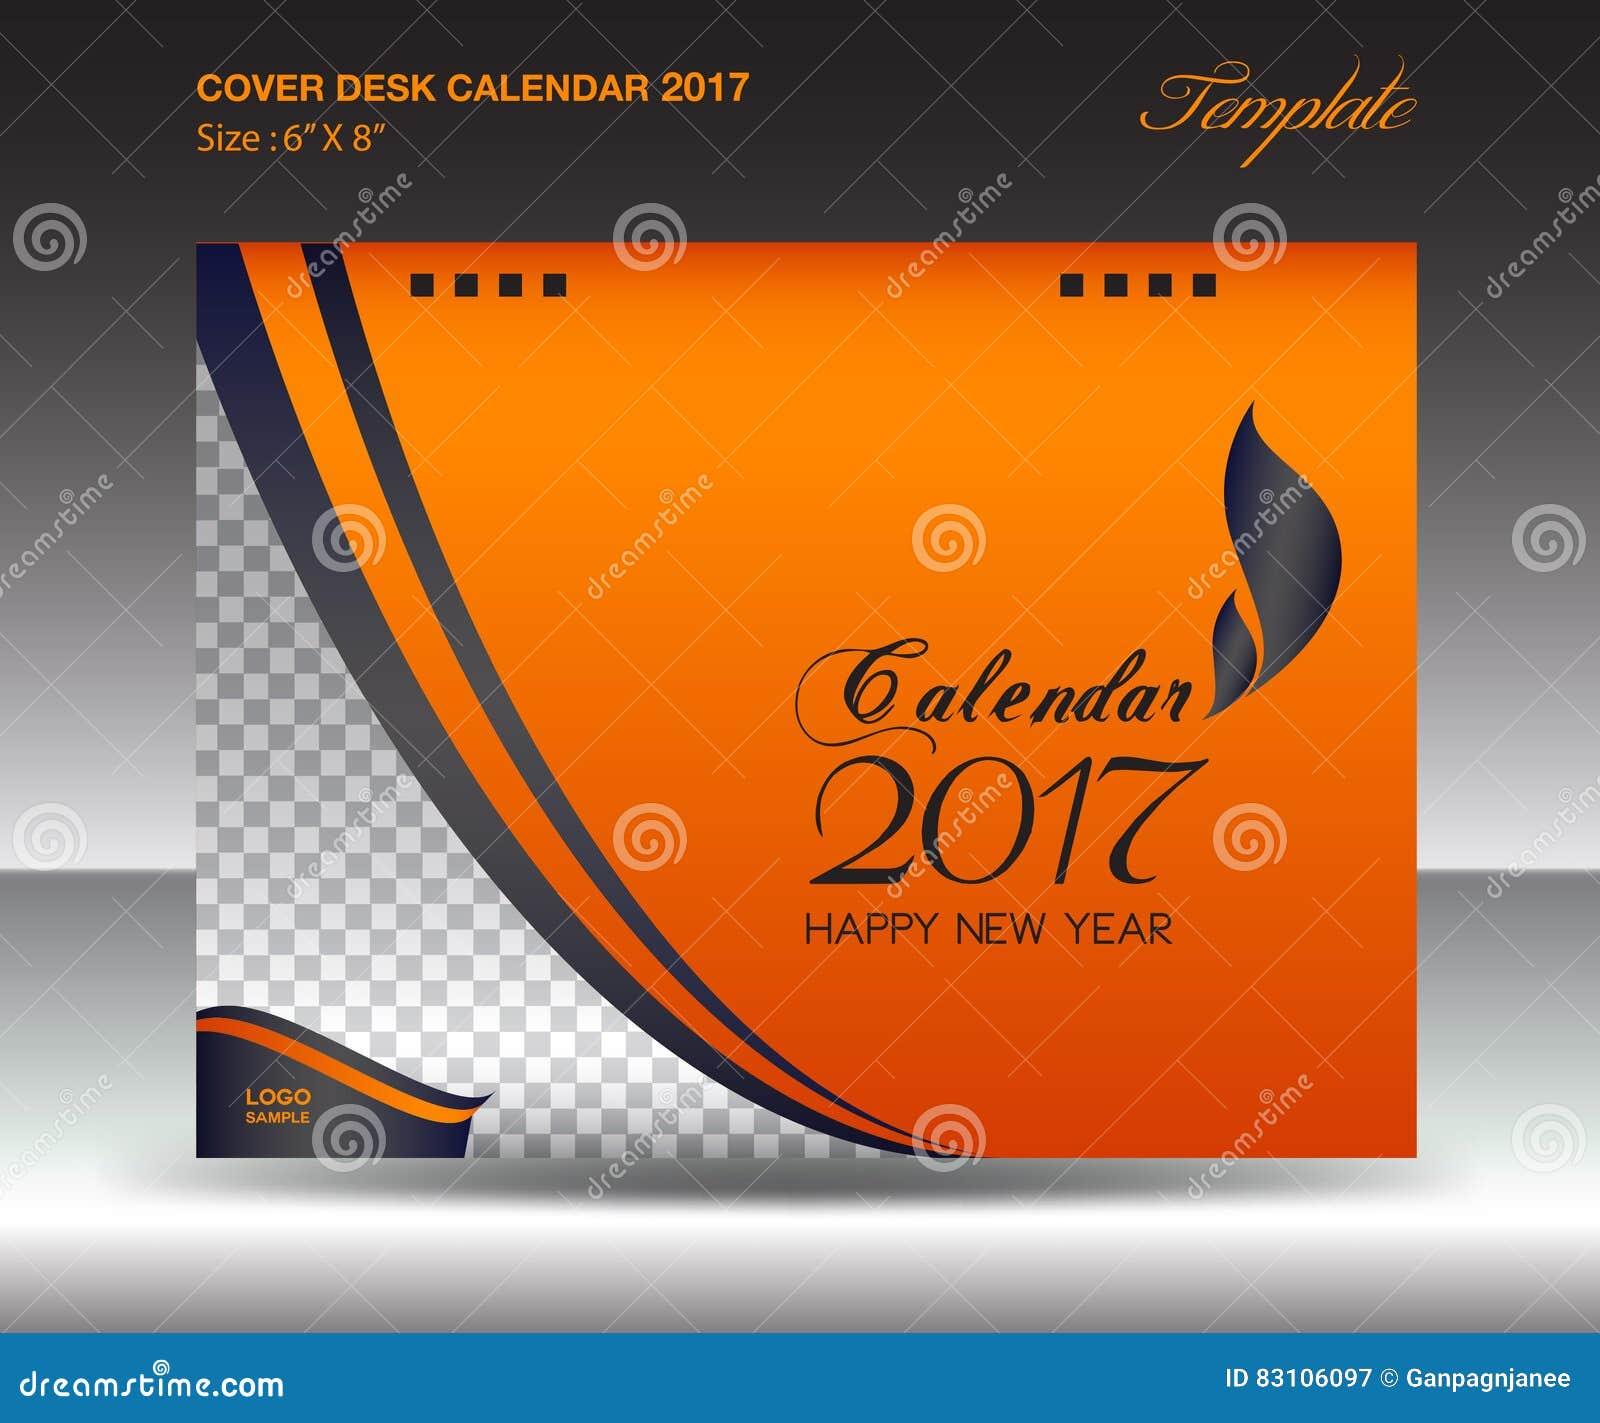 Calendar Cover : Desk calendar year size inch horizontal orange